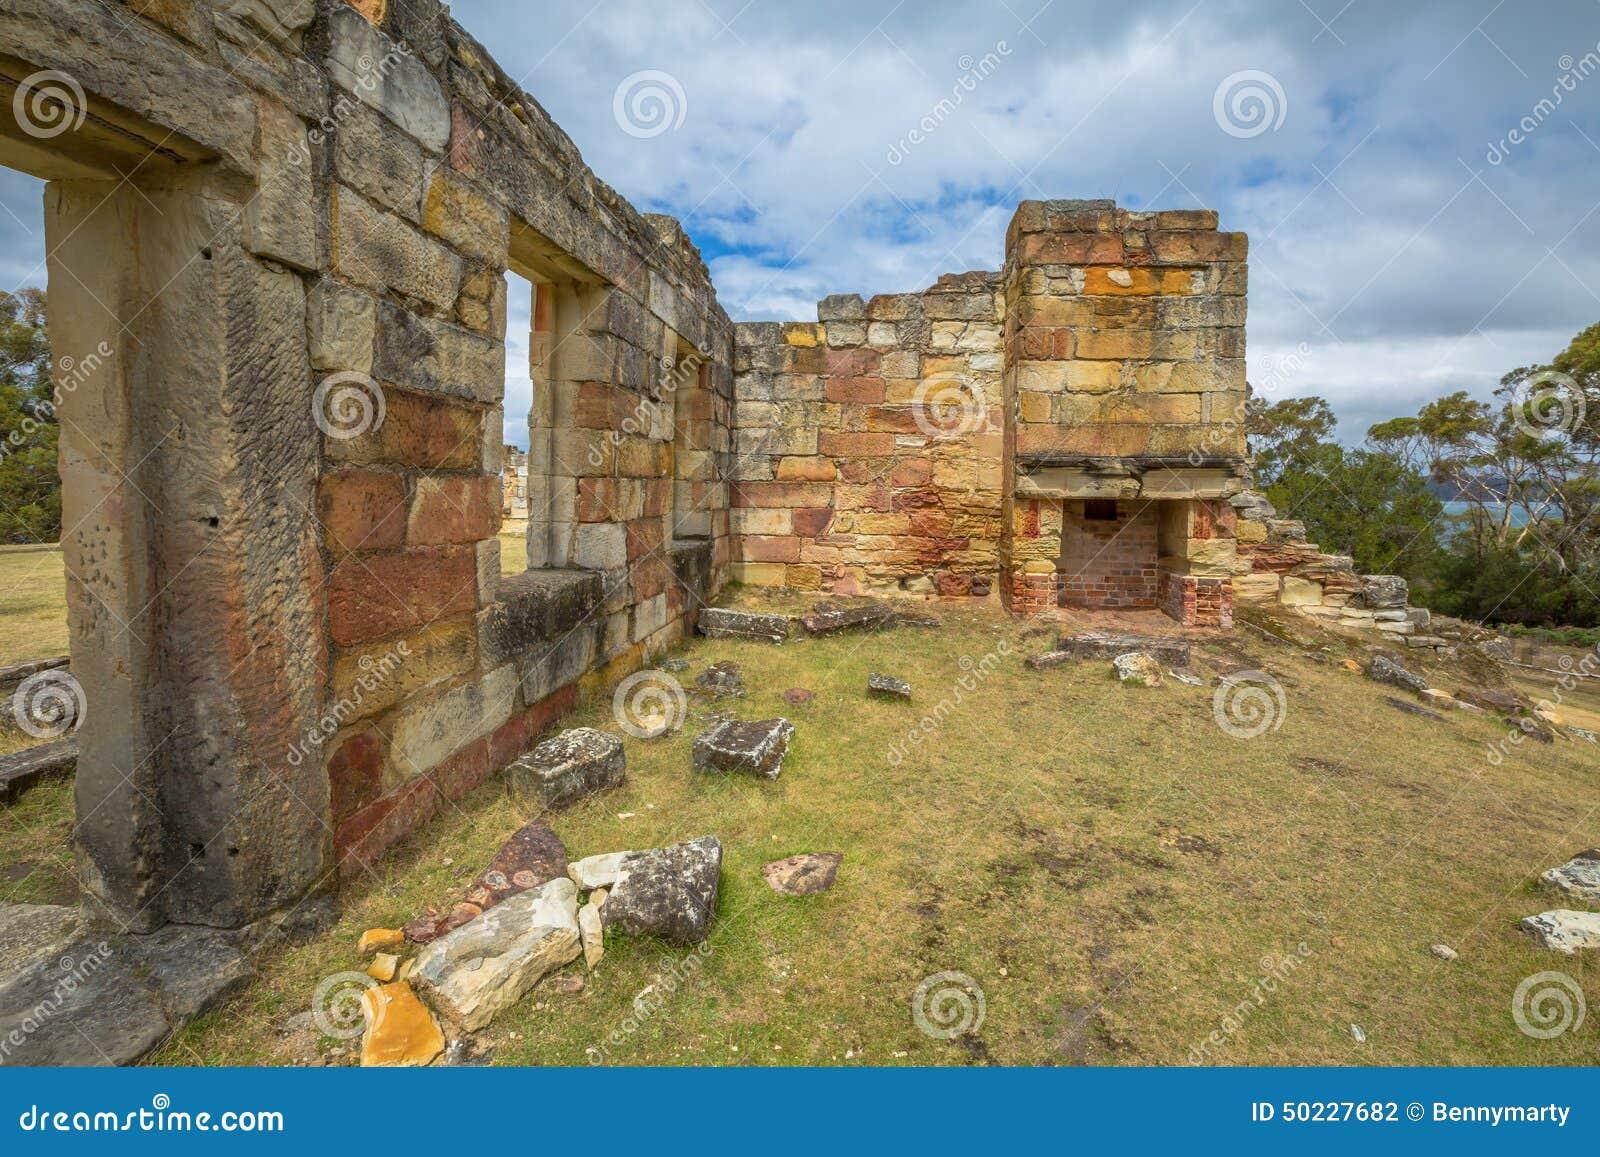 Minas de carbón sitio histórico, Tasmania